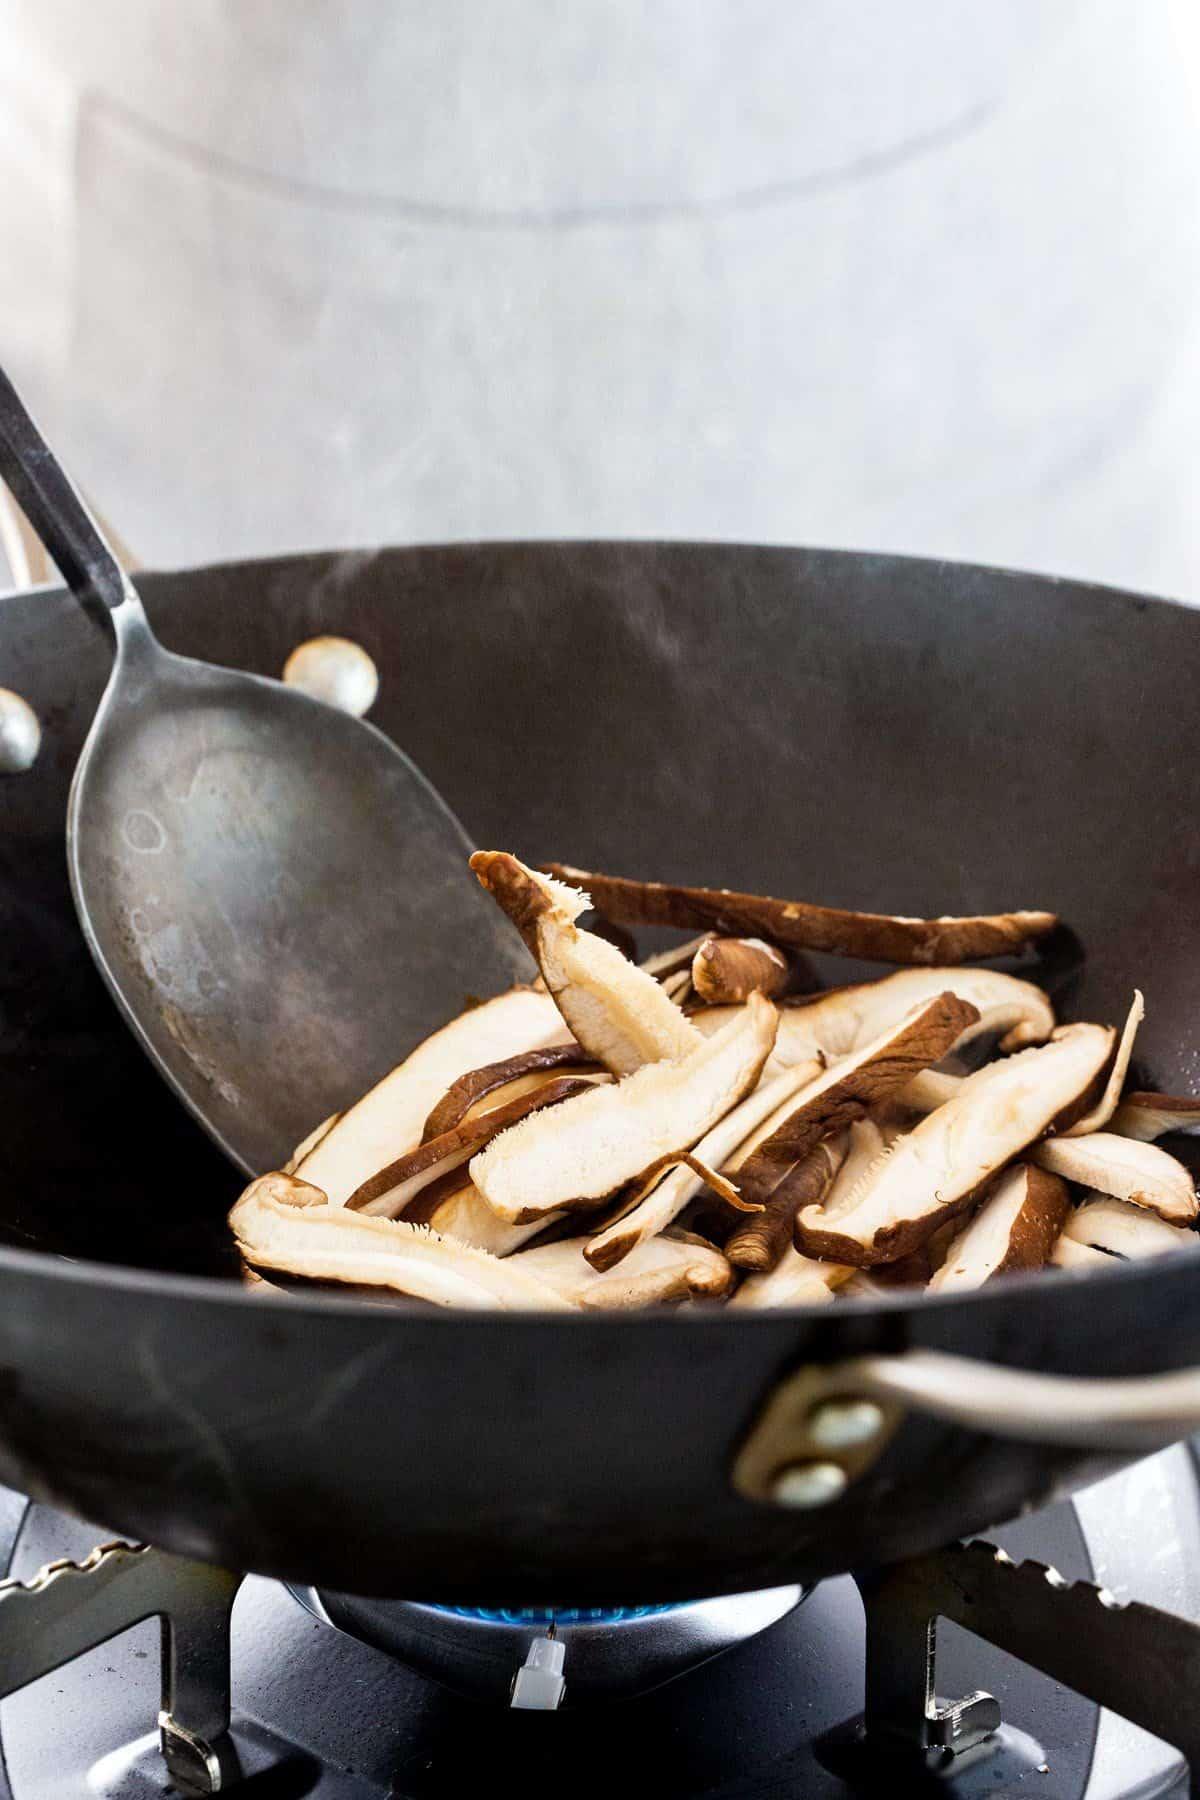 cooking mushrooms in a wok